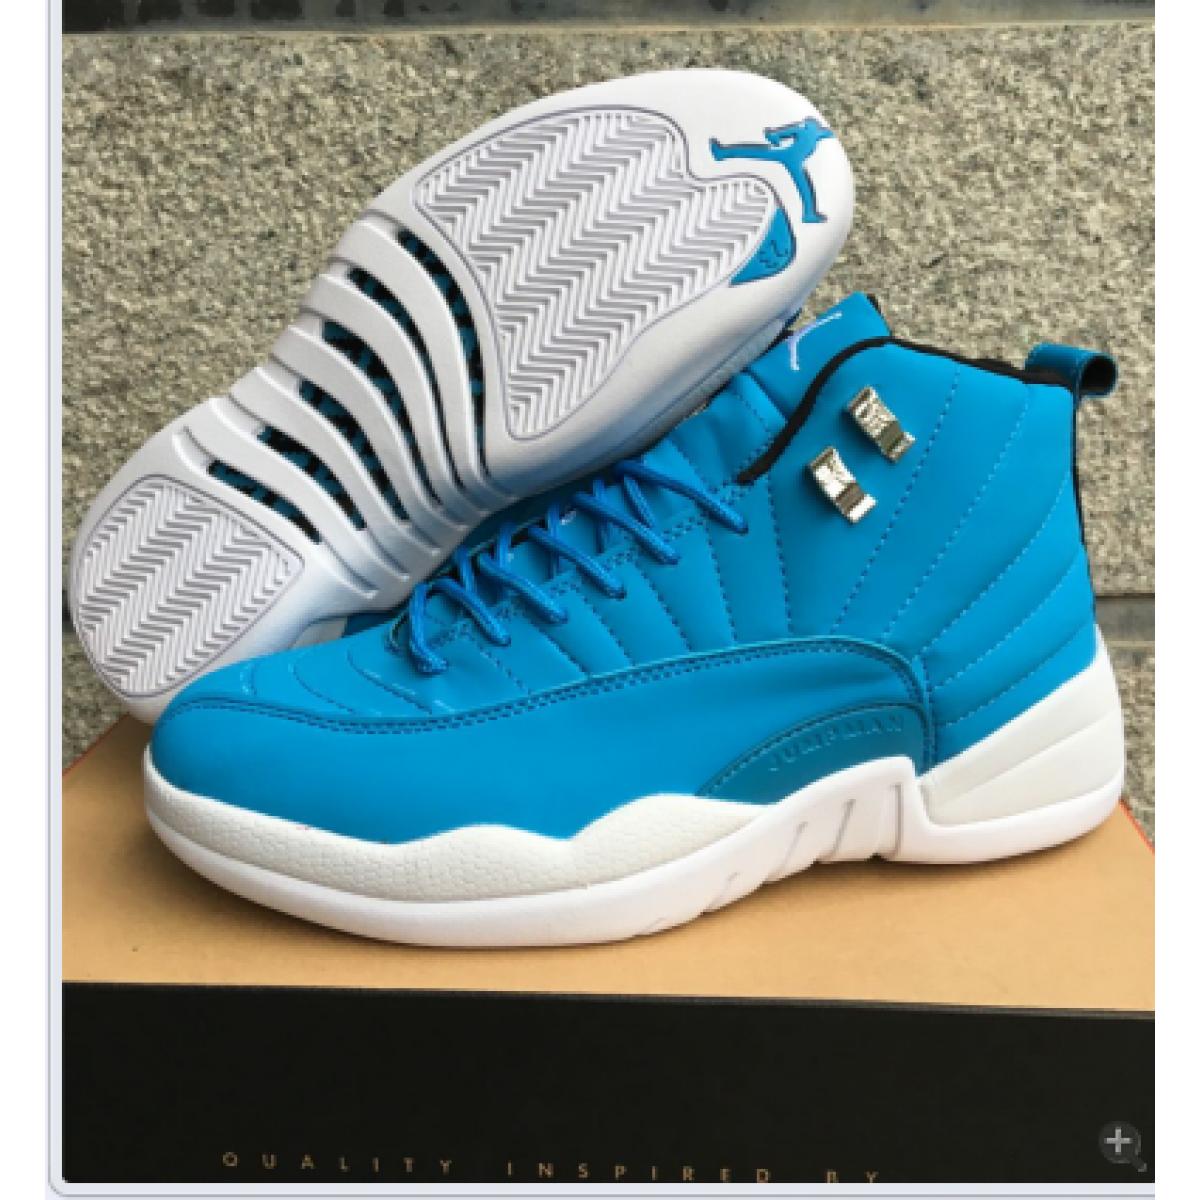 low priced a8772 ae59e Air Jordan 12 White Light Blue Men Women Shoes